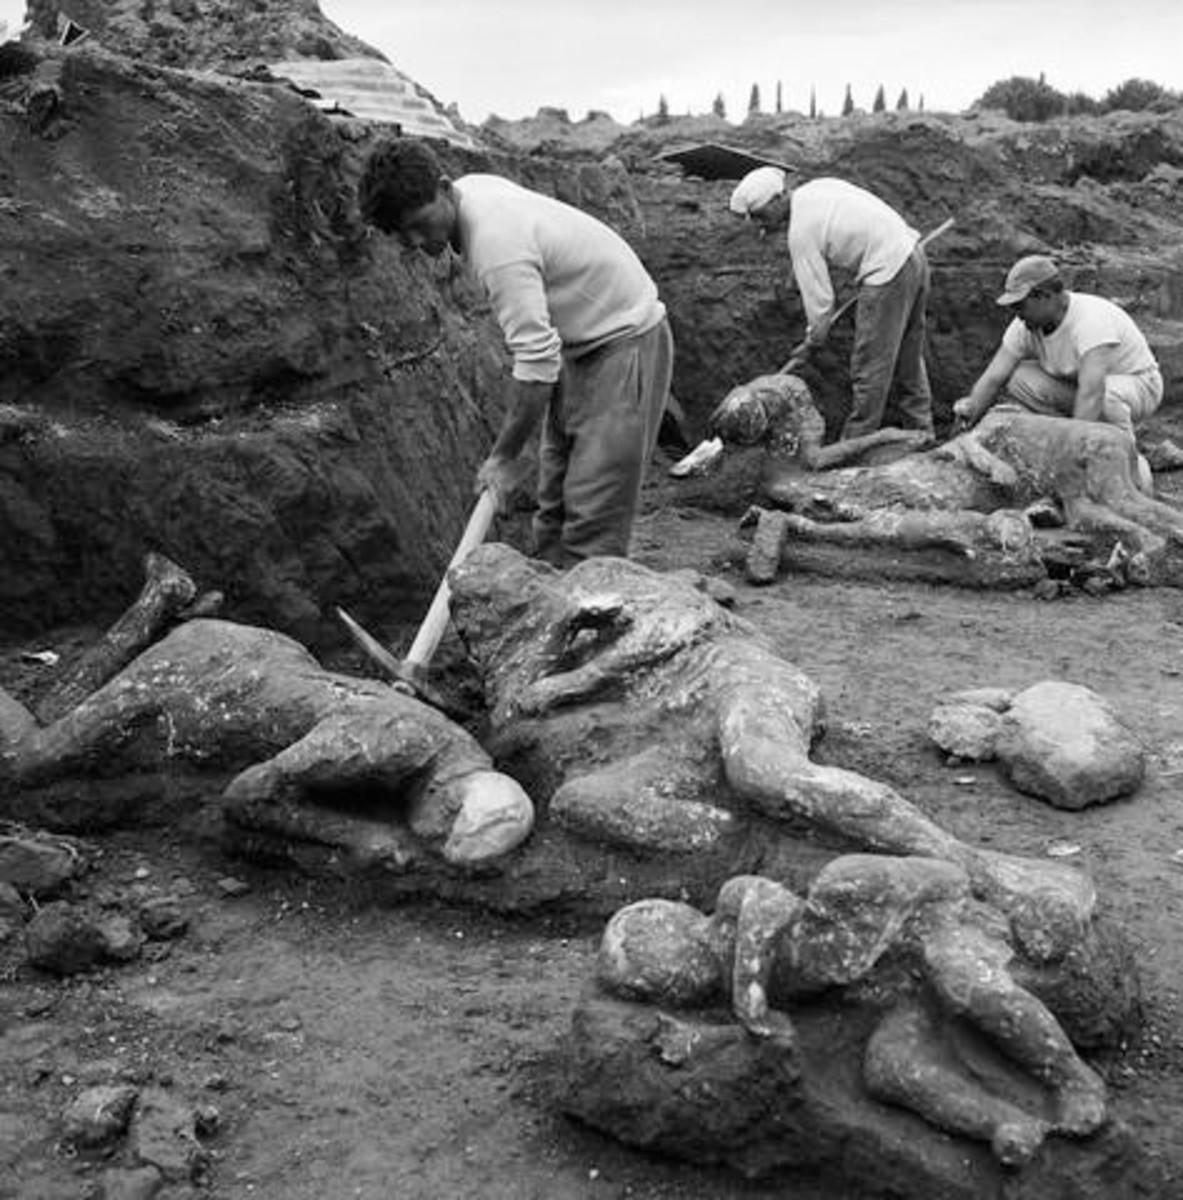 Excavation around plaster casts at Pompeii